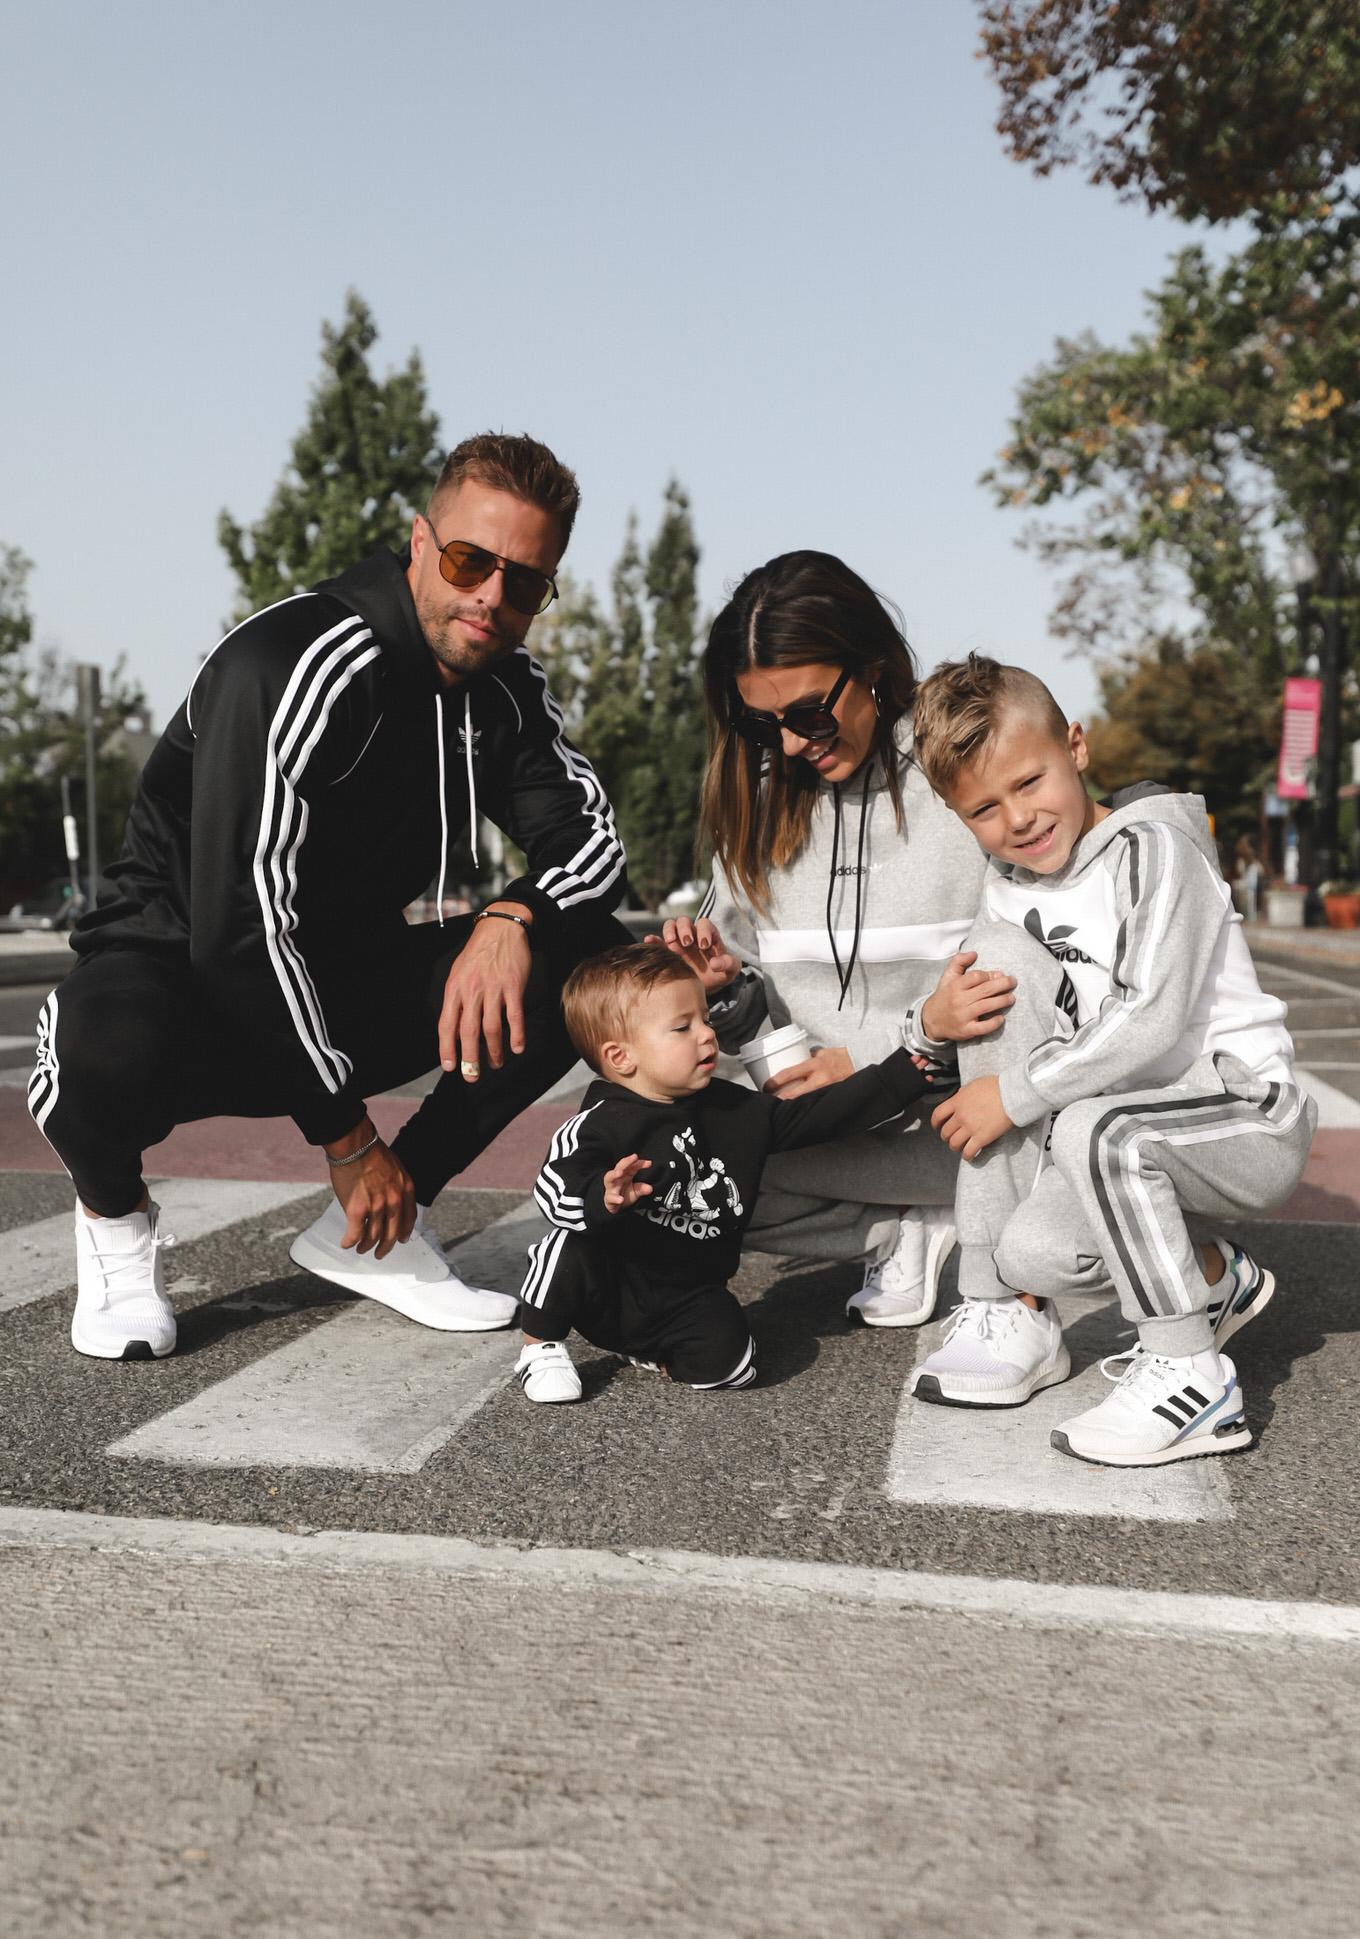 andrew family in adidas